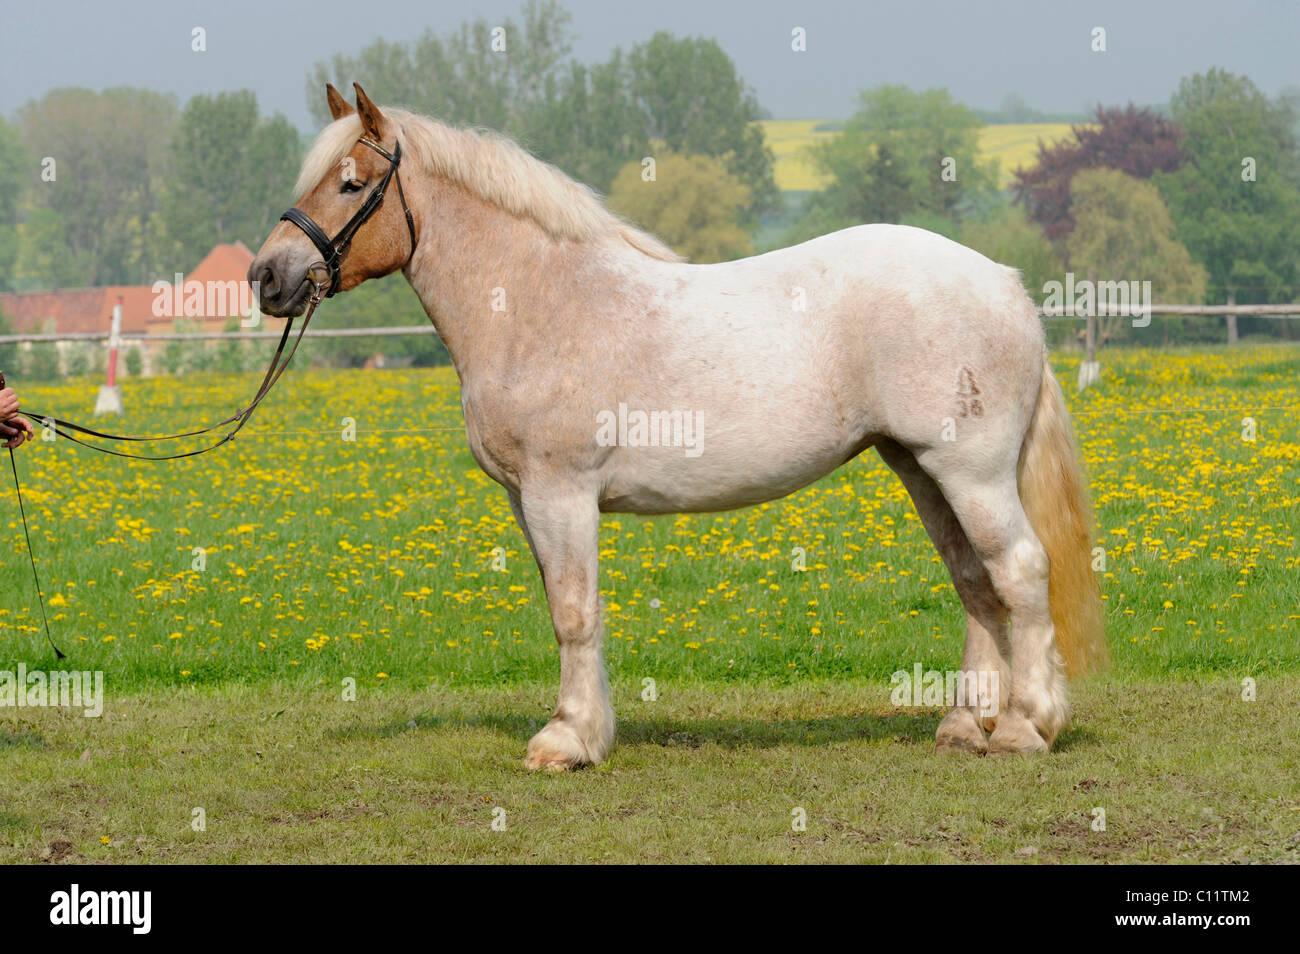 Saxon-Thuringian draft horse, mare, chestnut horse, standing - Stock Image